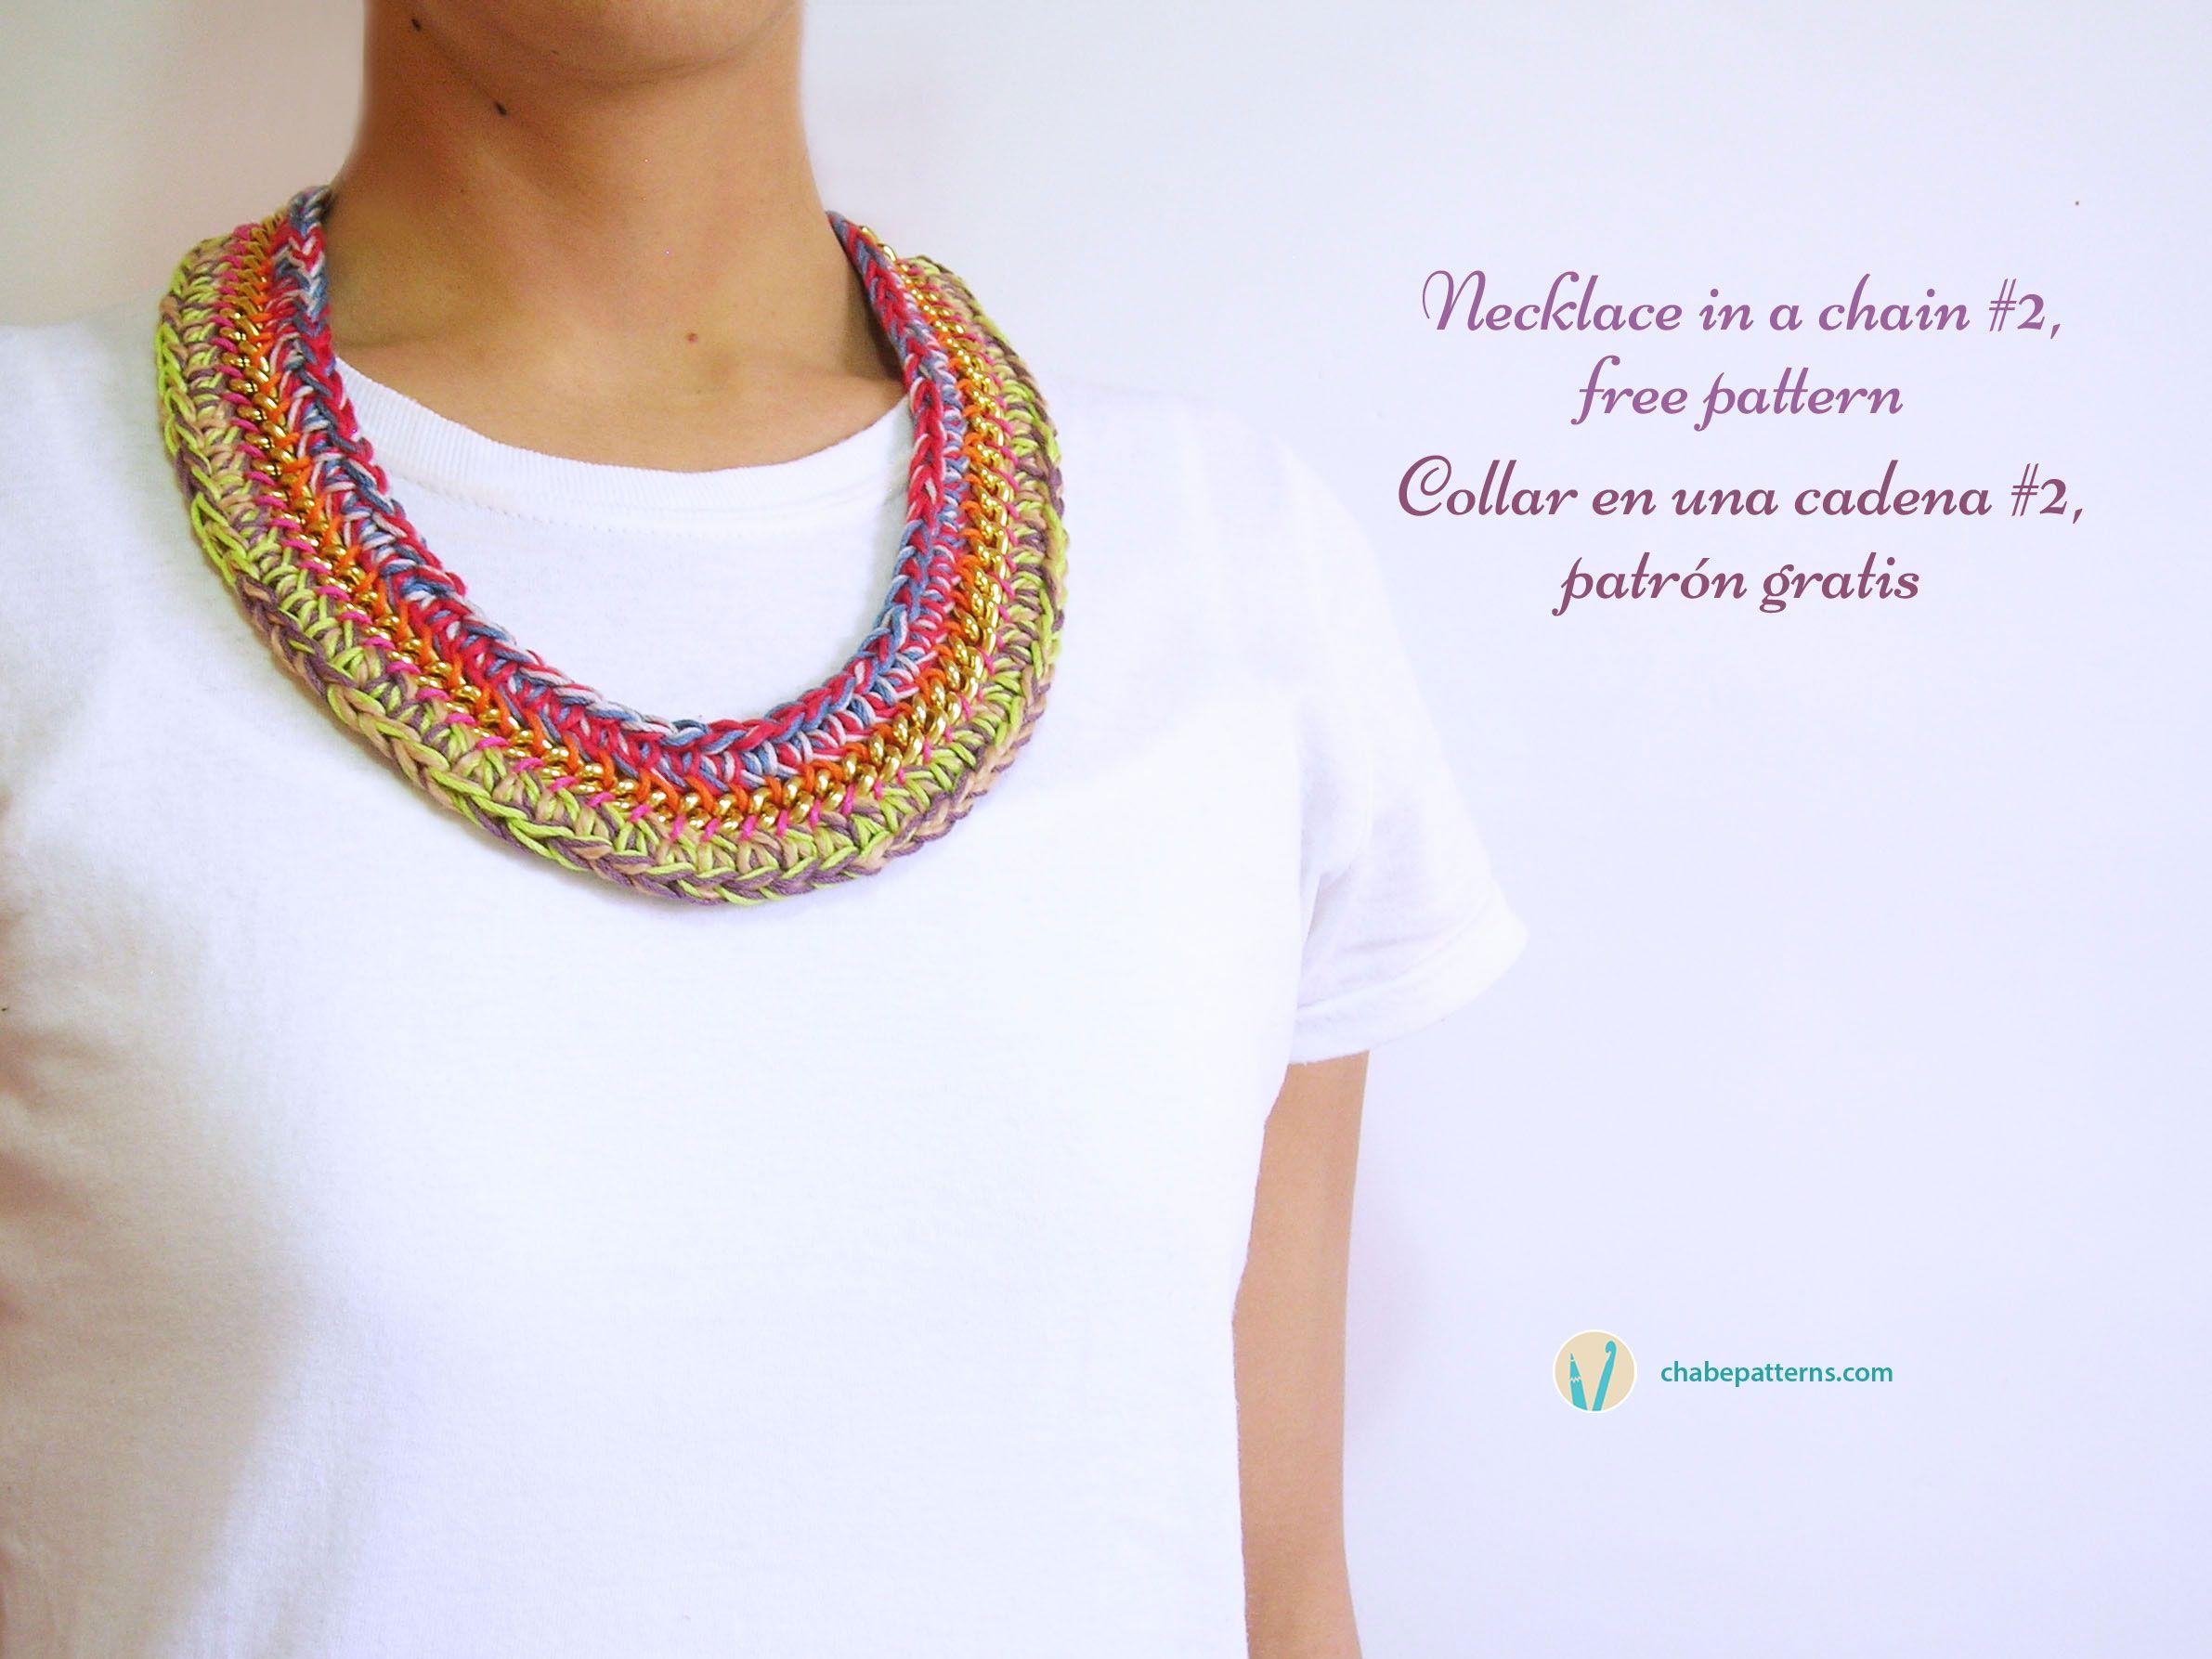 Crochet in a chain #2/ Crochet en una cadena #2 | aros crochet ...